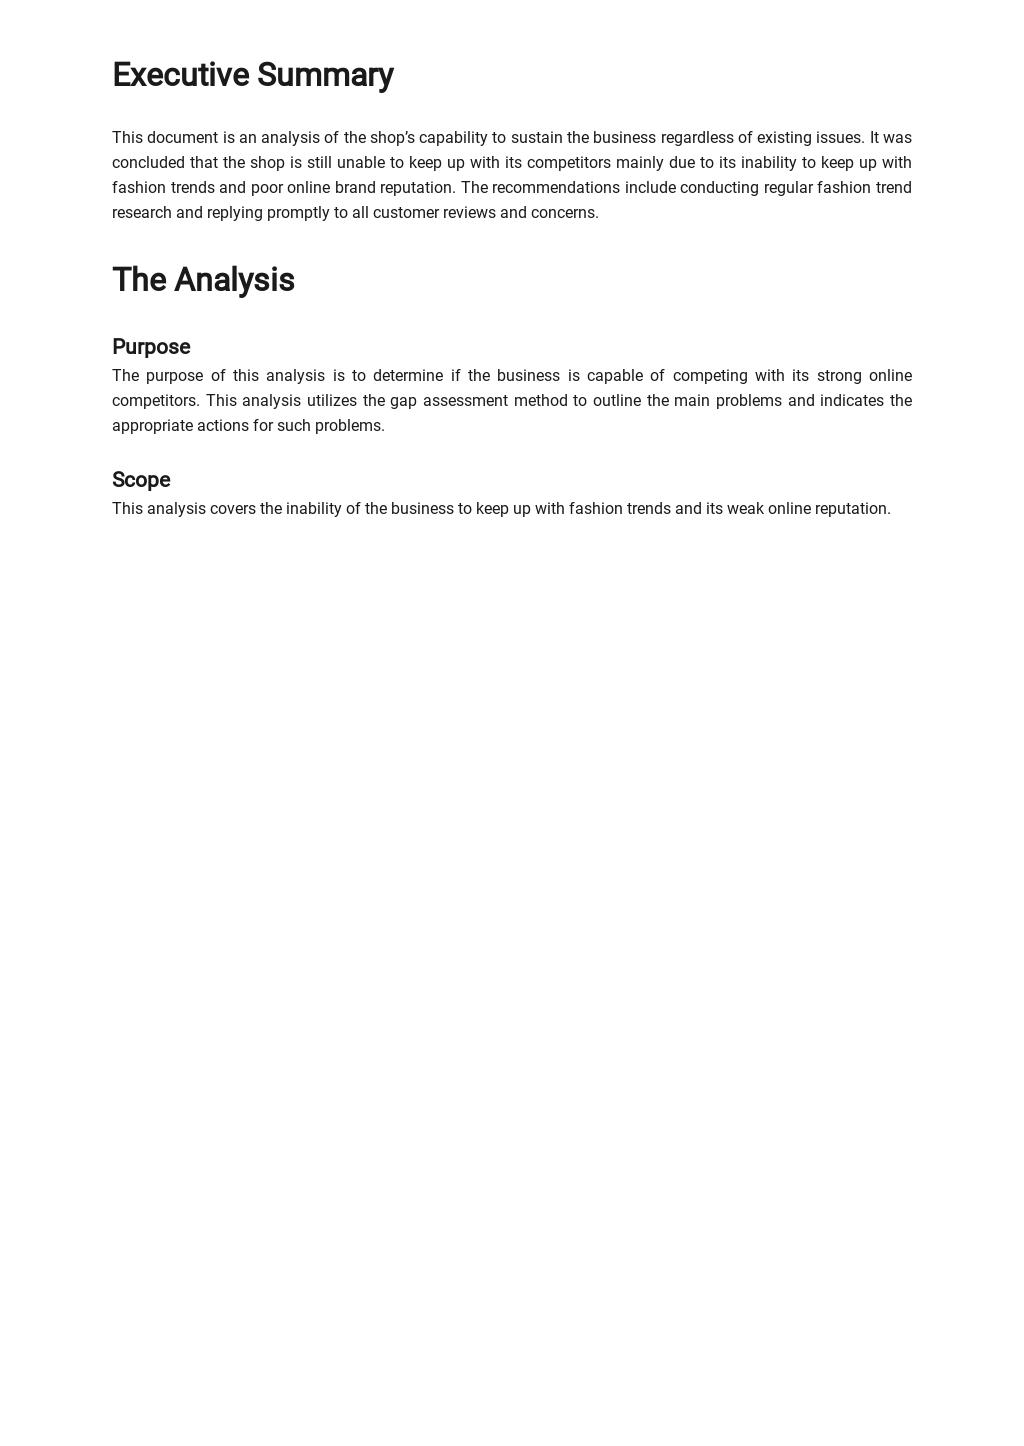 Capabilities Analysis Template 1.jpe